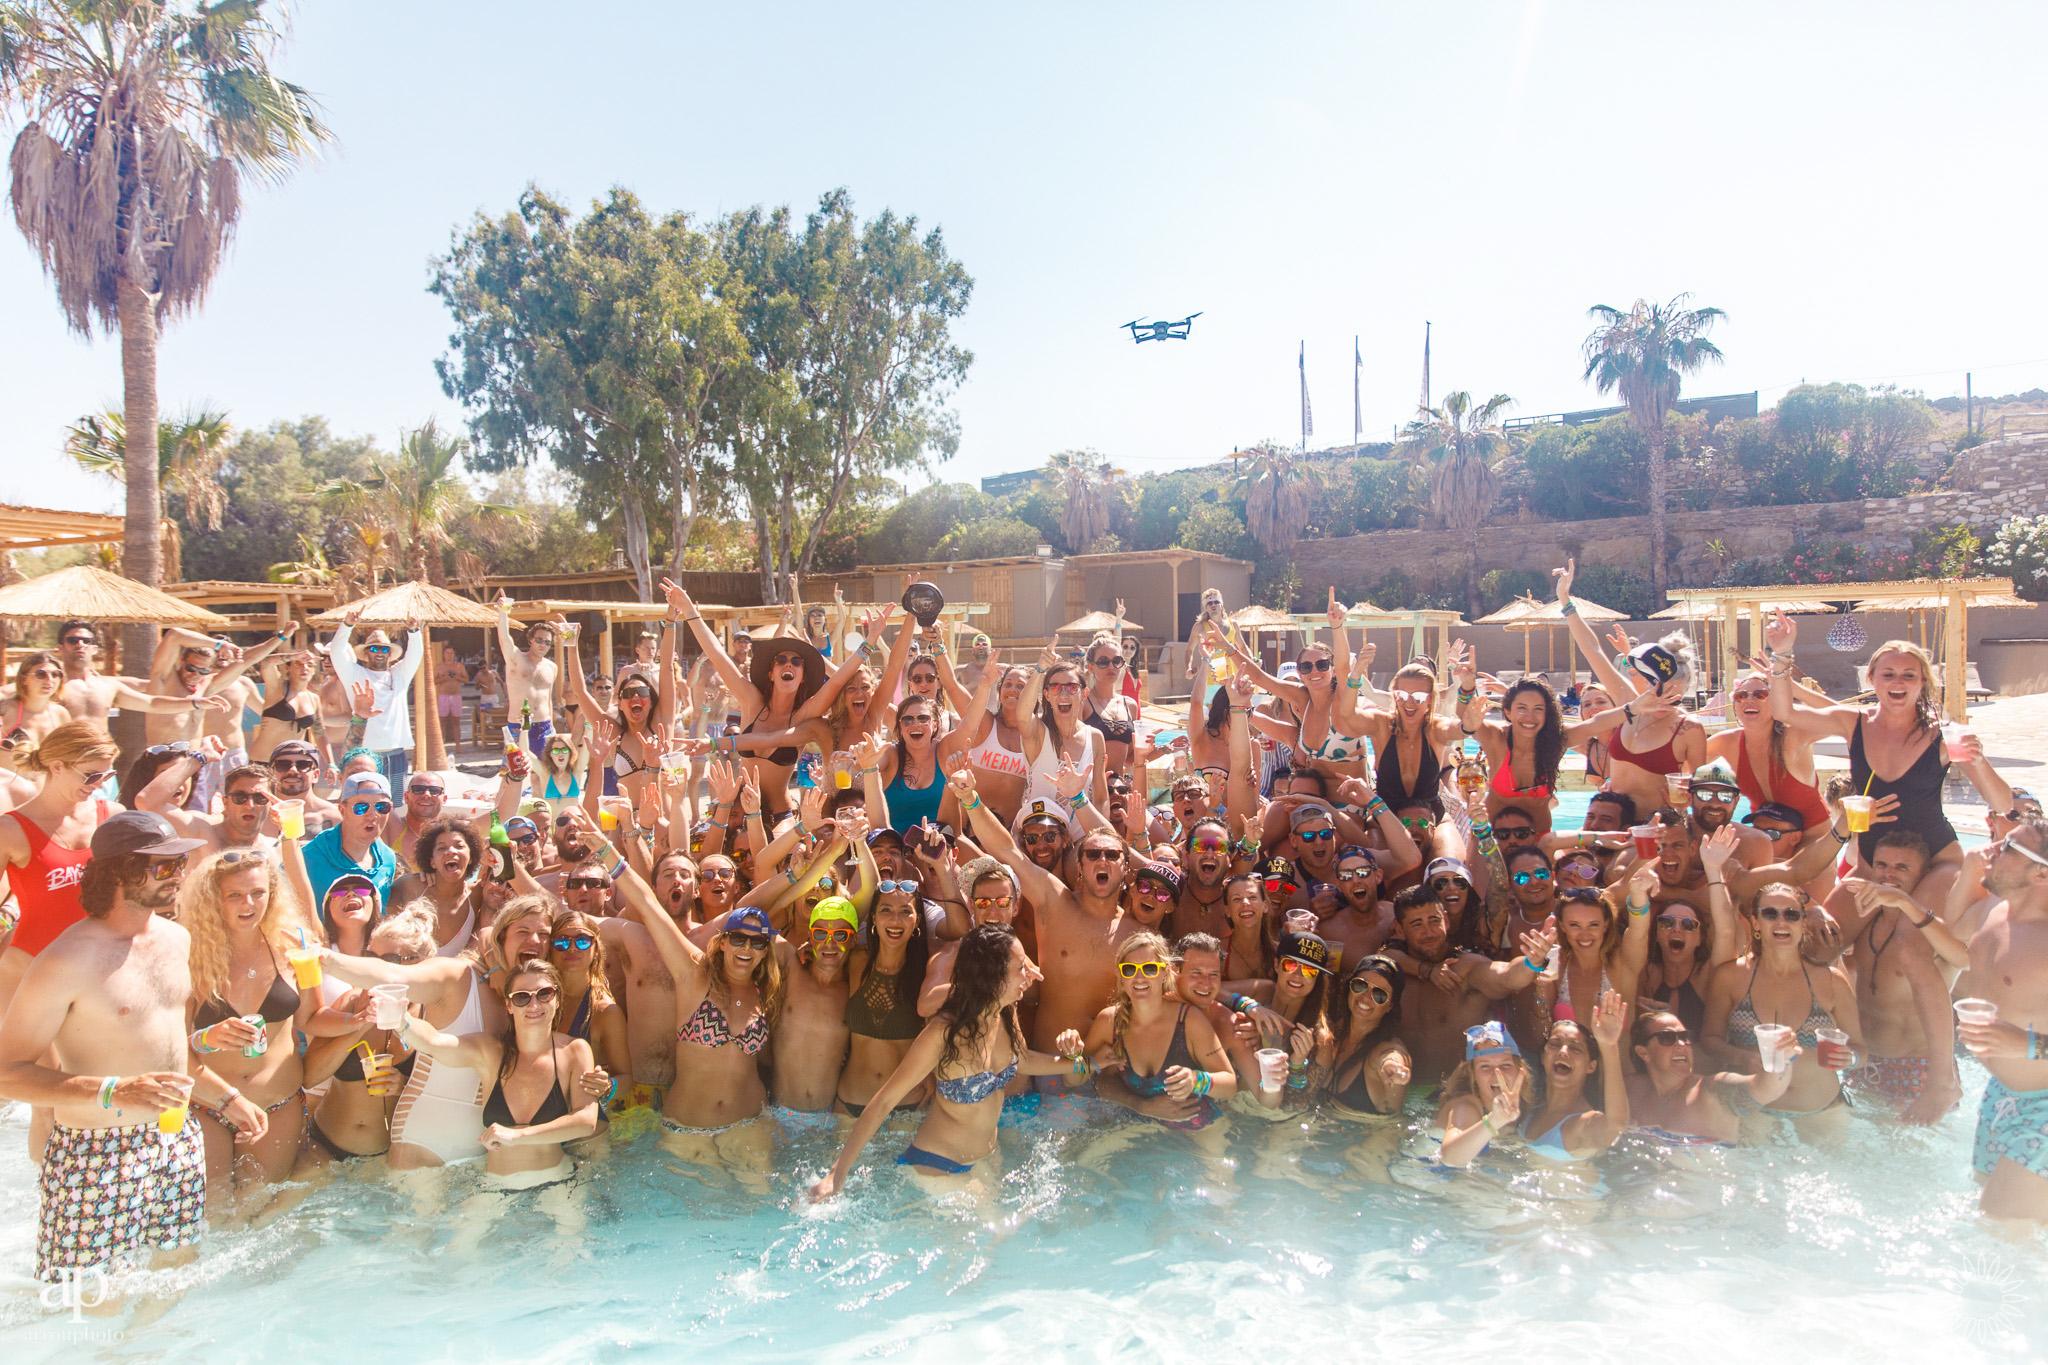 Punda Coast Pool Party - The Mykonos Route